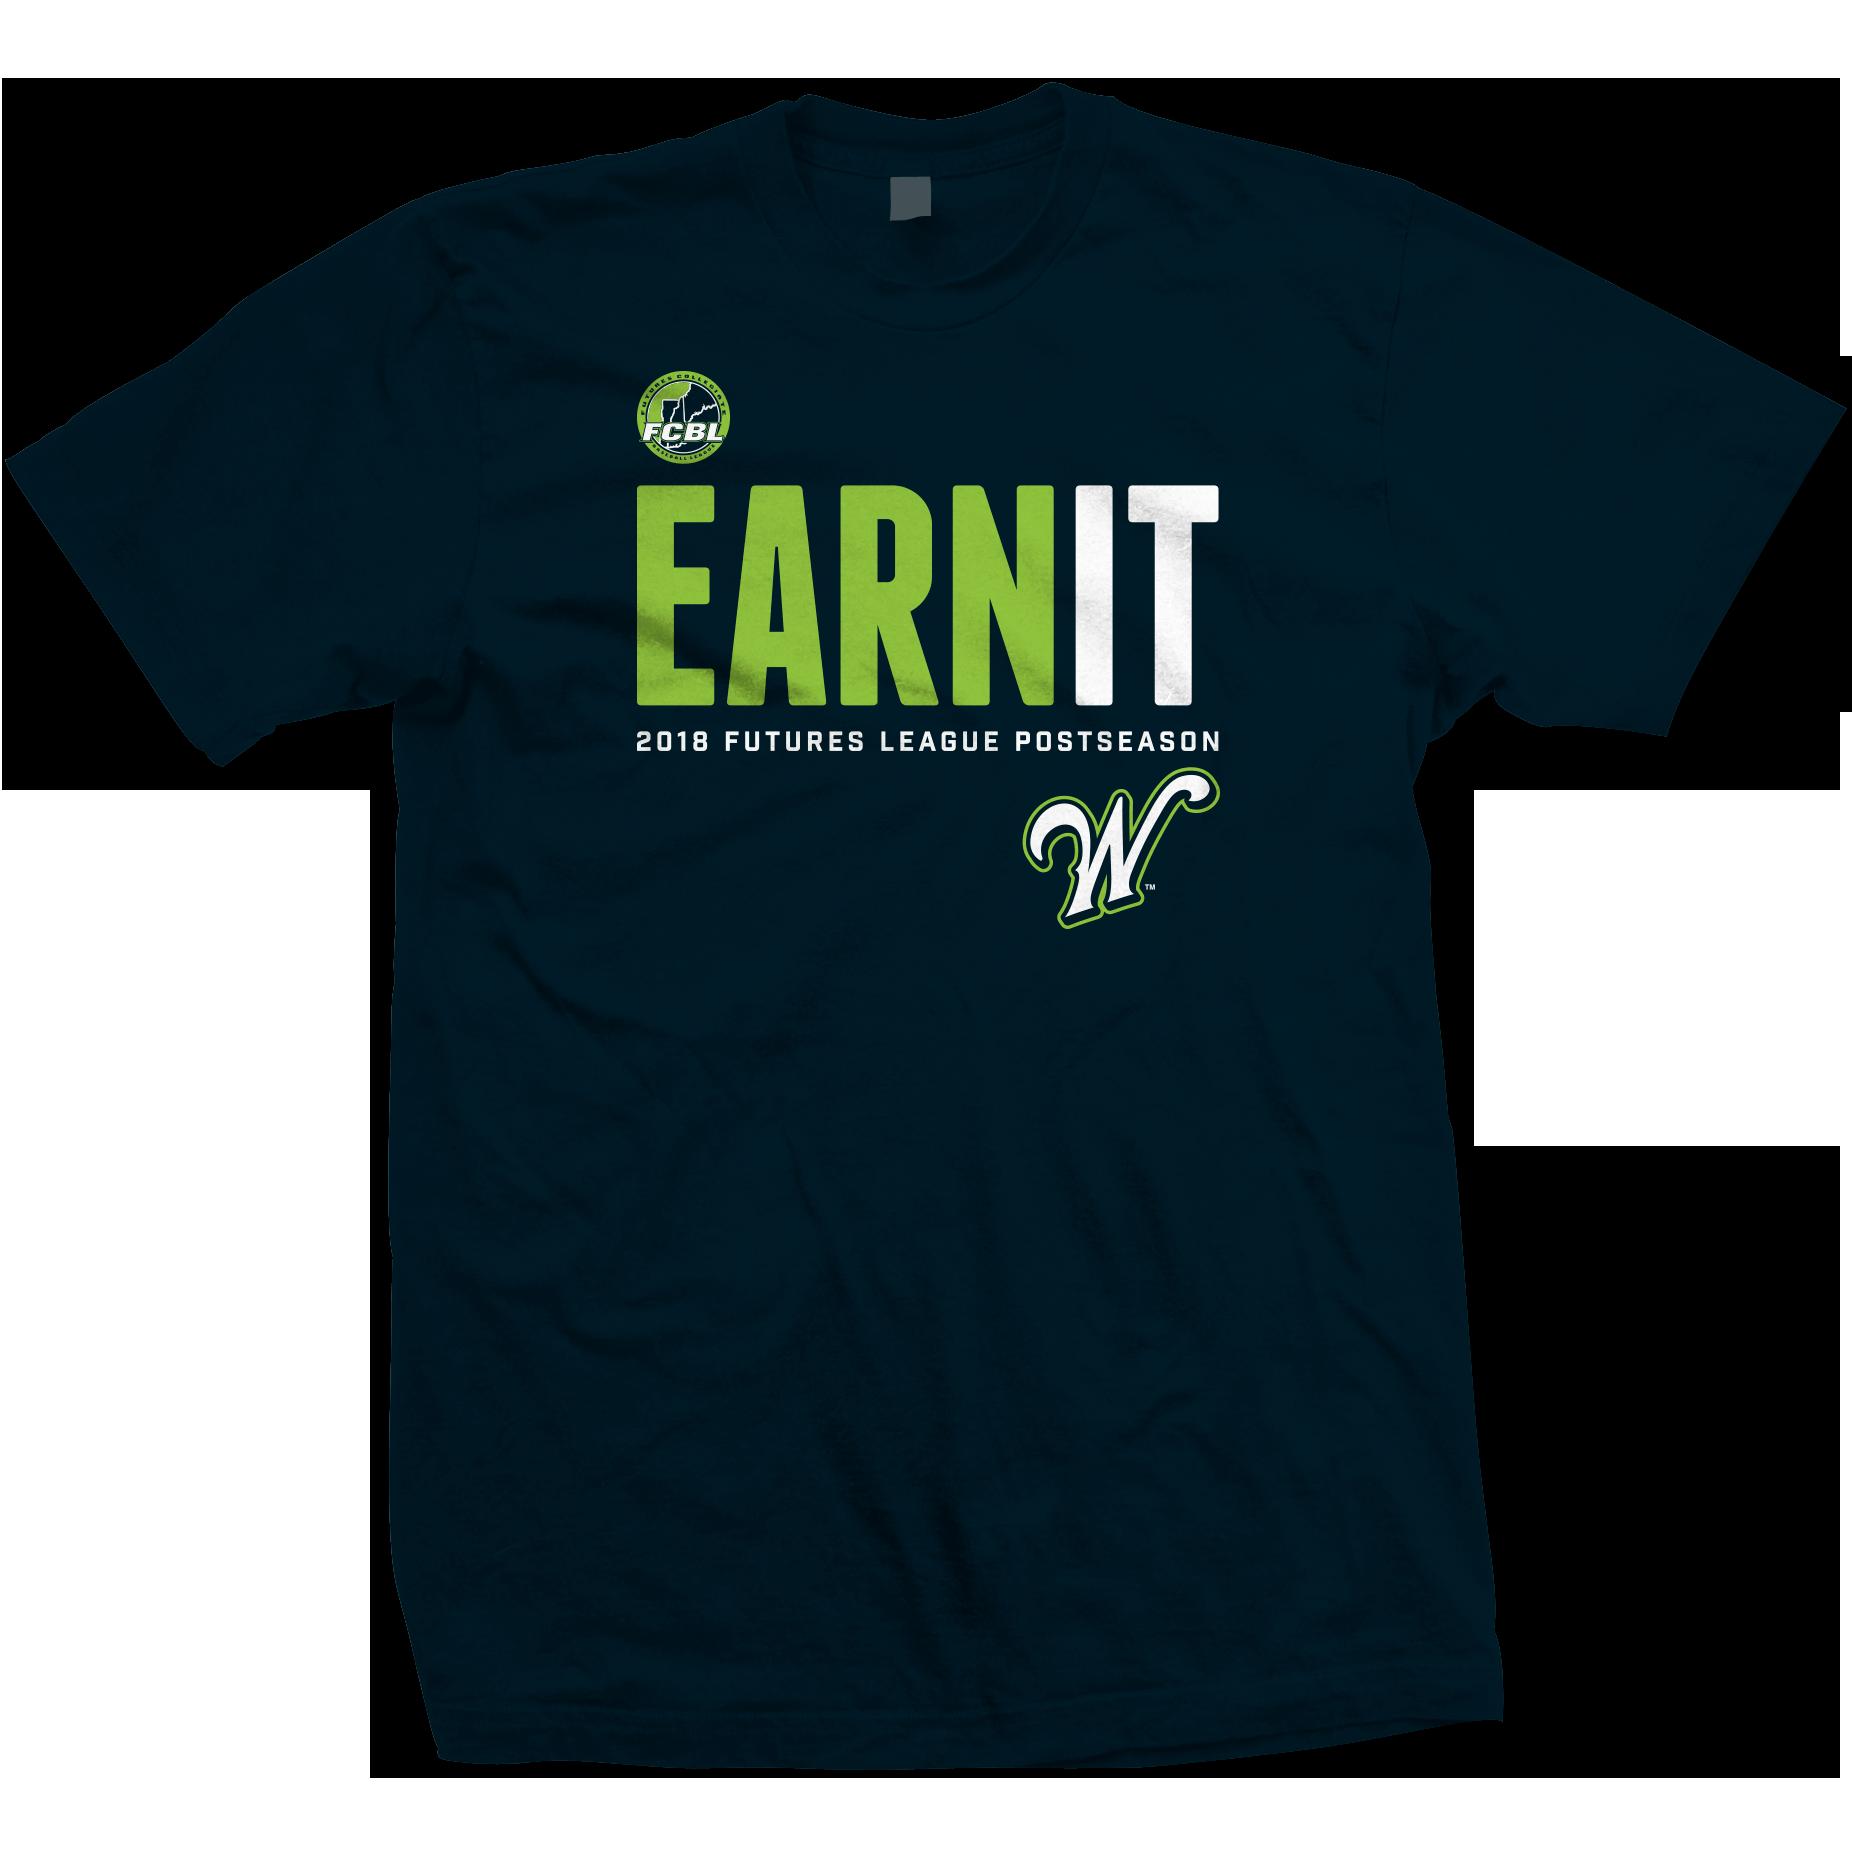 WB_Shirt_Earn_It_01.png